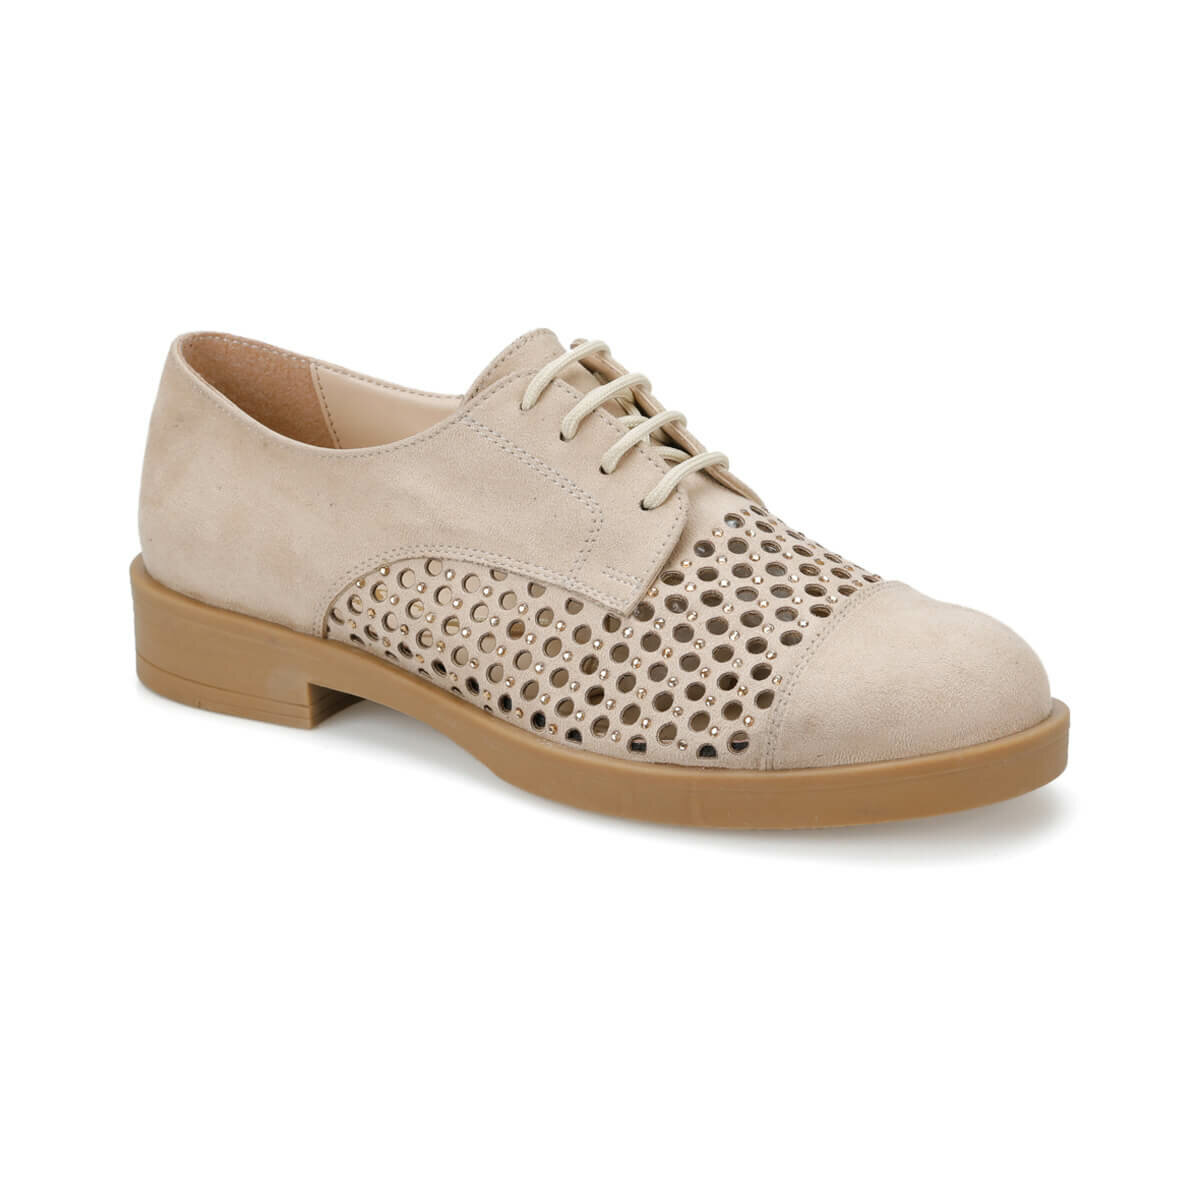 FLO DS19043 Beige Women Oxford Shoes Miss F